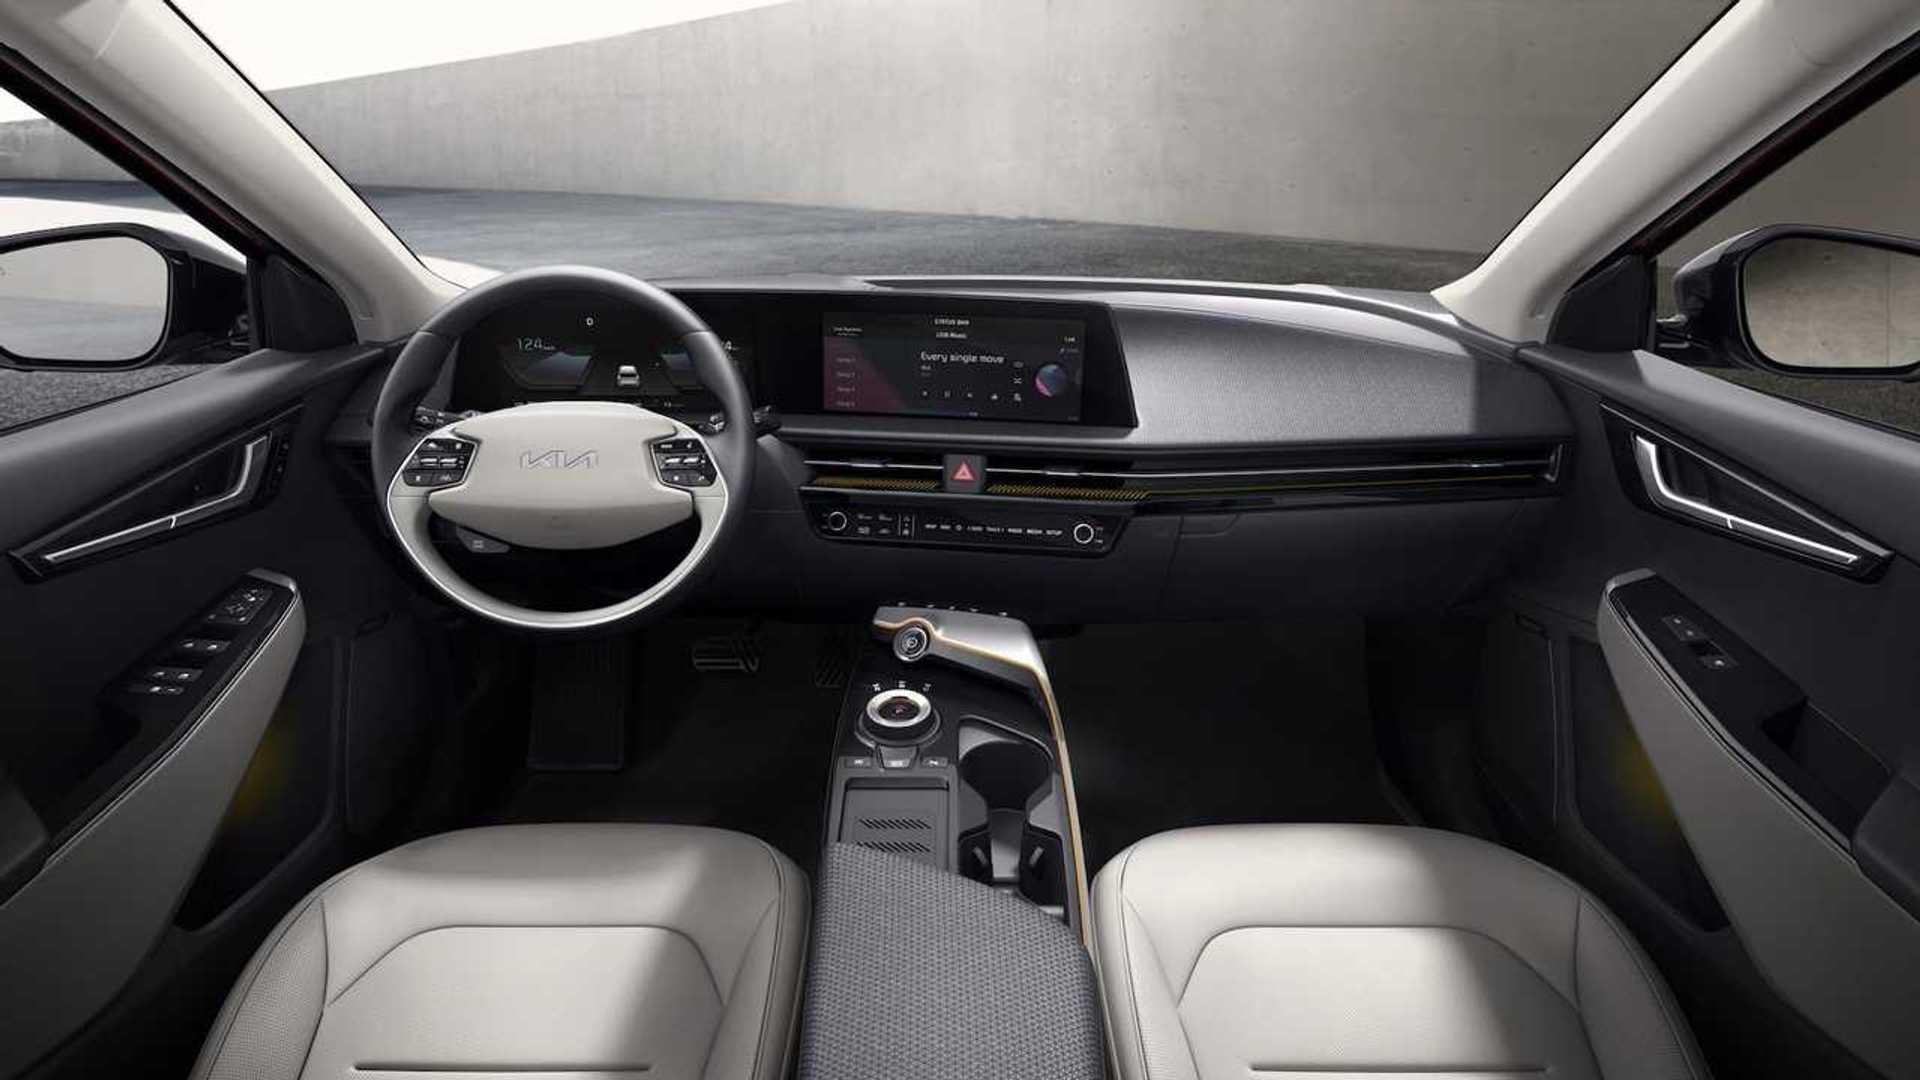 Kia EV6 Front Interior Dashboard